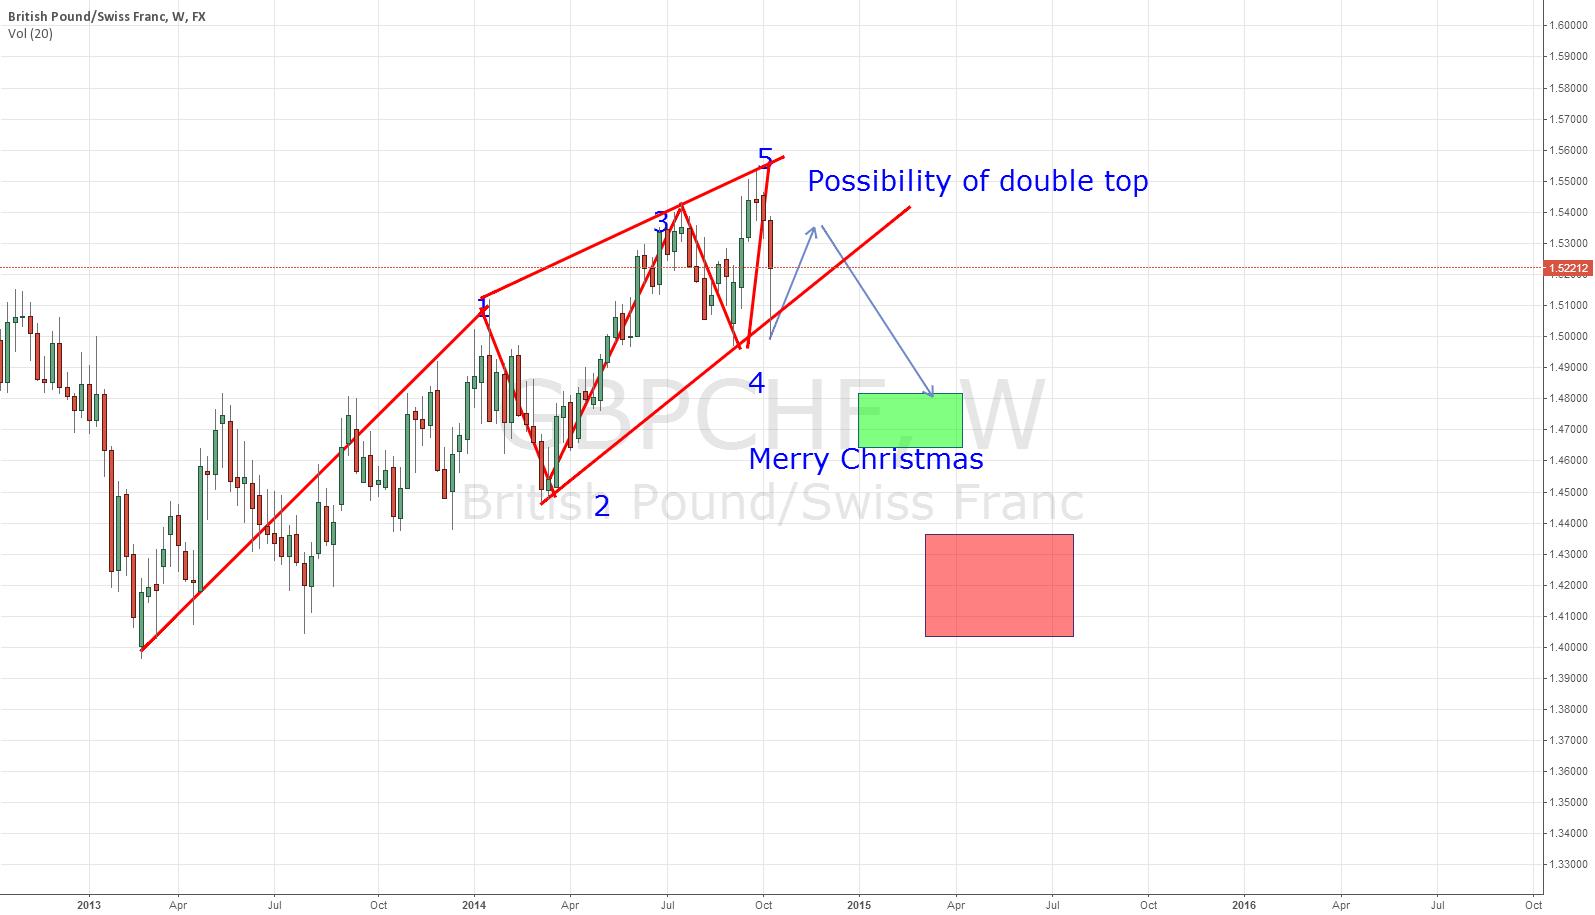 Possiblity till Christmas - Bearish